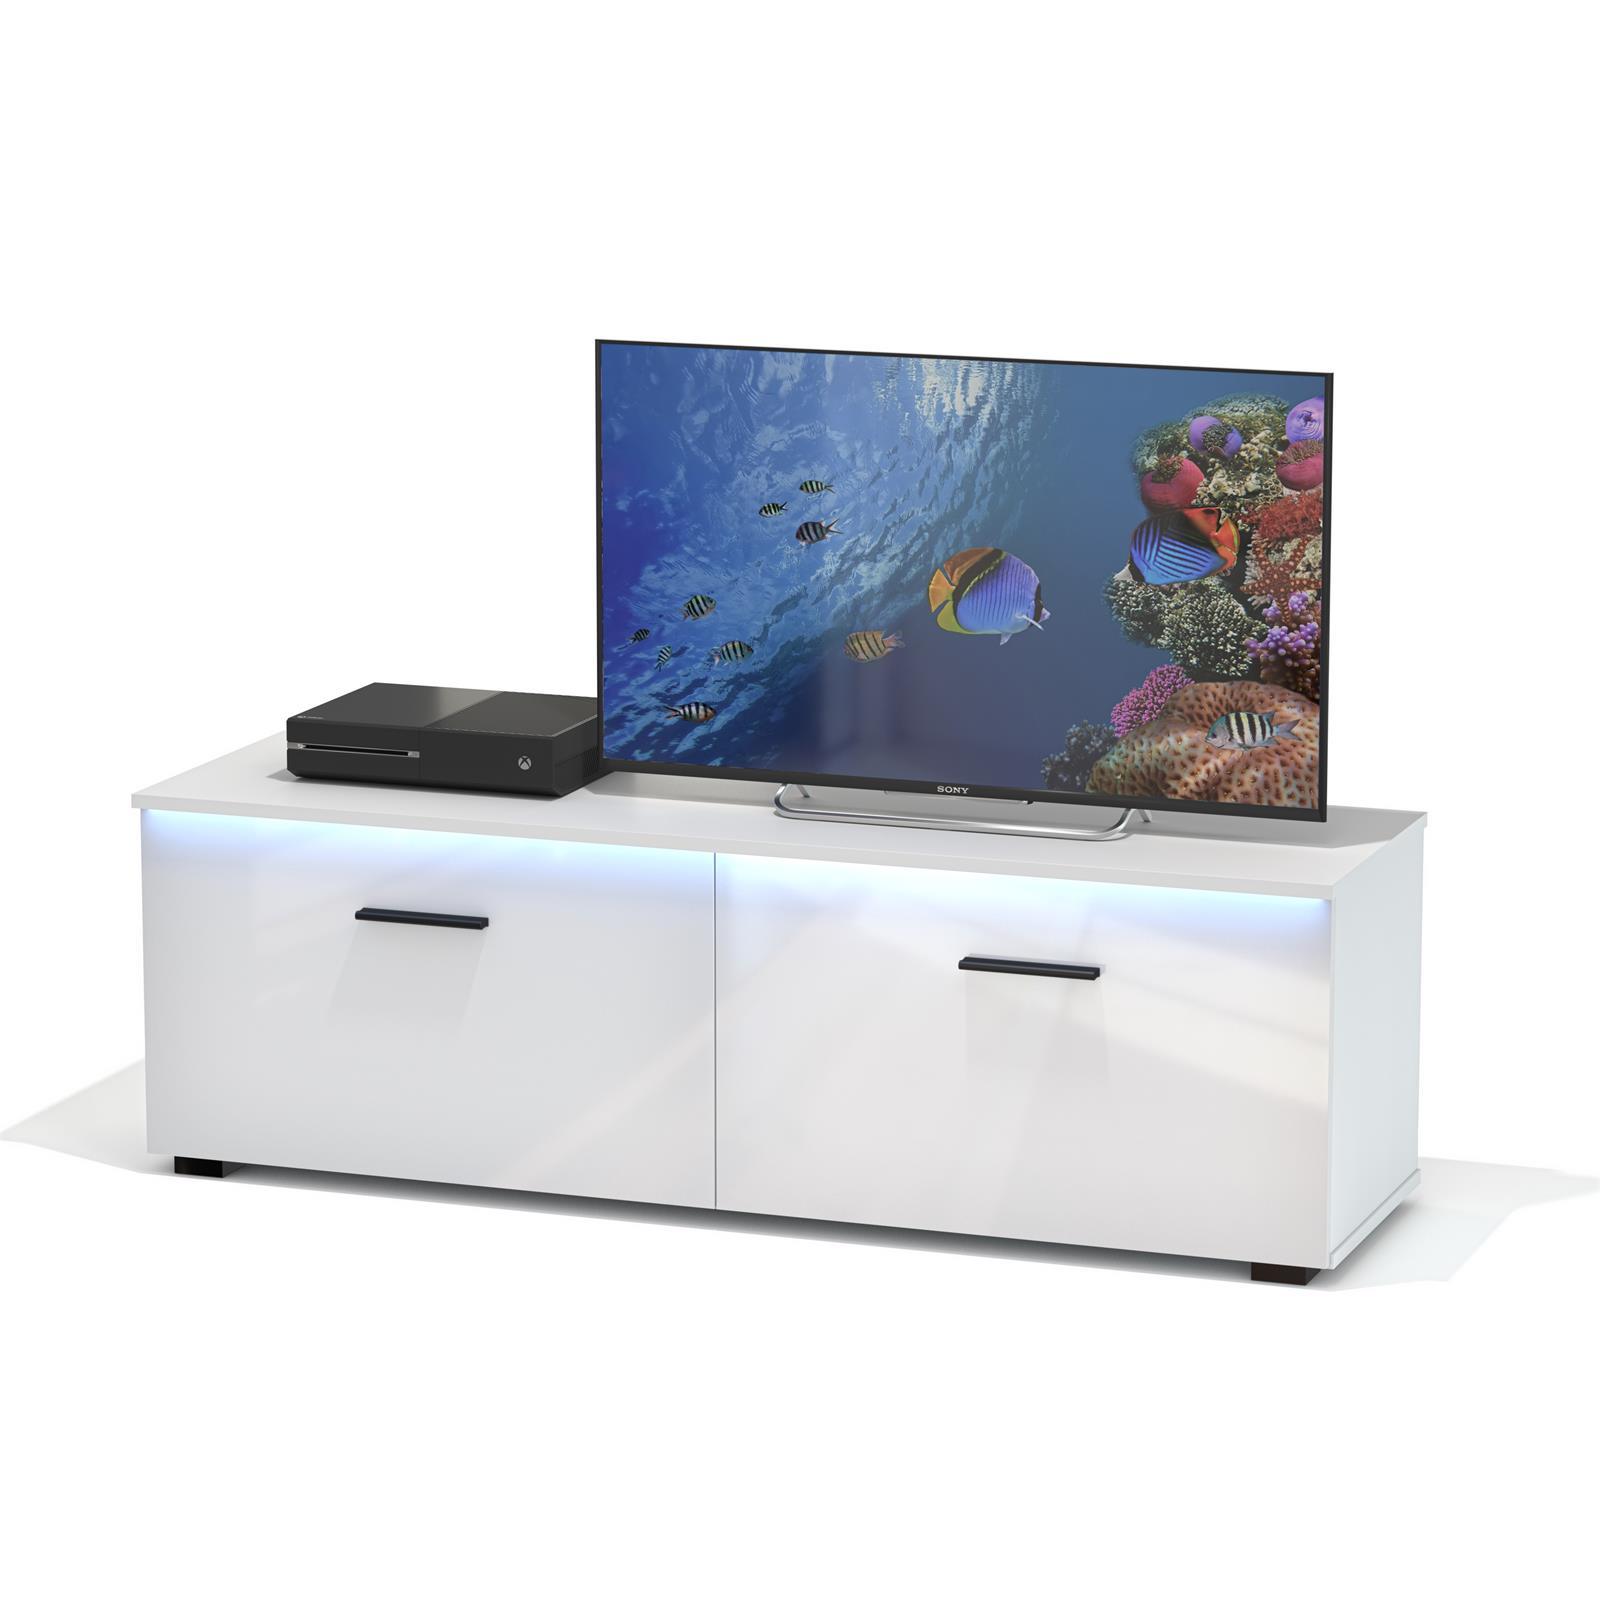 tv lowboard malibu wei hochglanz mit led beleuchtung. Black Bedroom Furniture Sets. Home Design Ideas